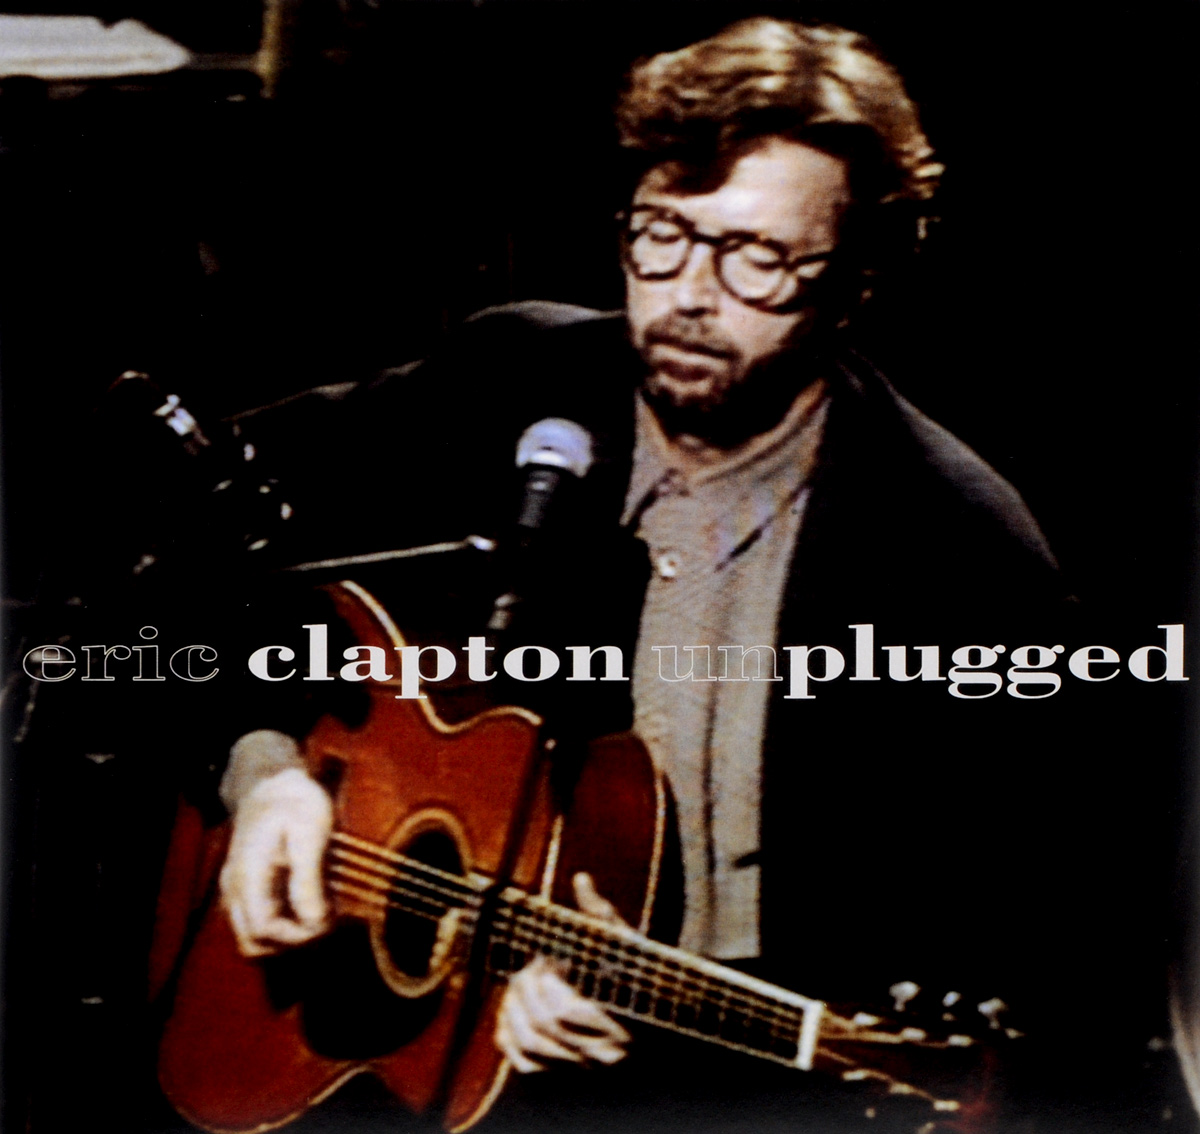 Эрик Клэптон Eric Clapton. Unplugged (2 LP) эрик клэптон eric clapton slowhand 35th anniversary edition lp